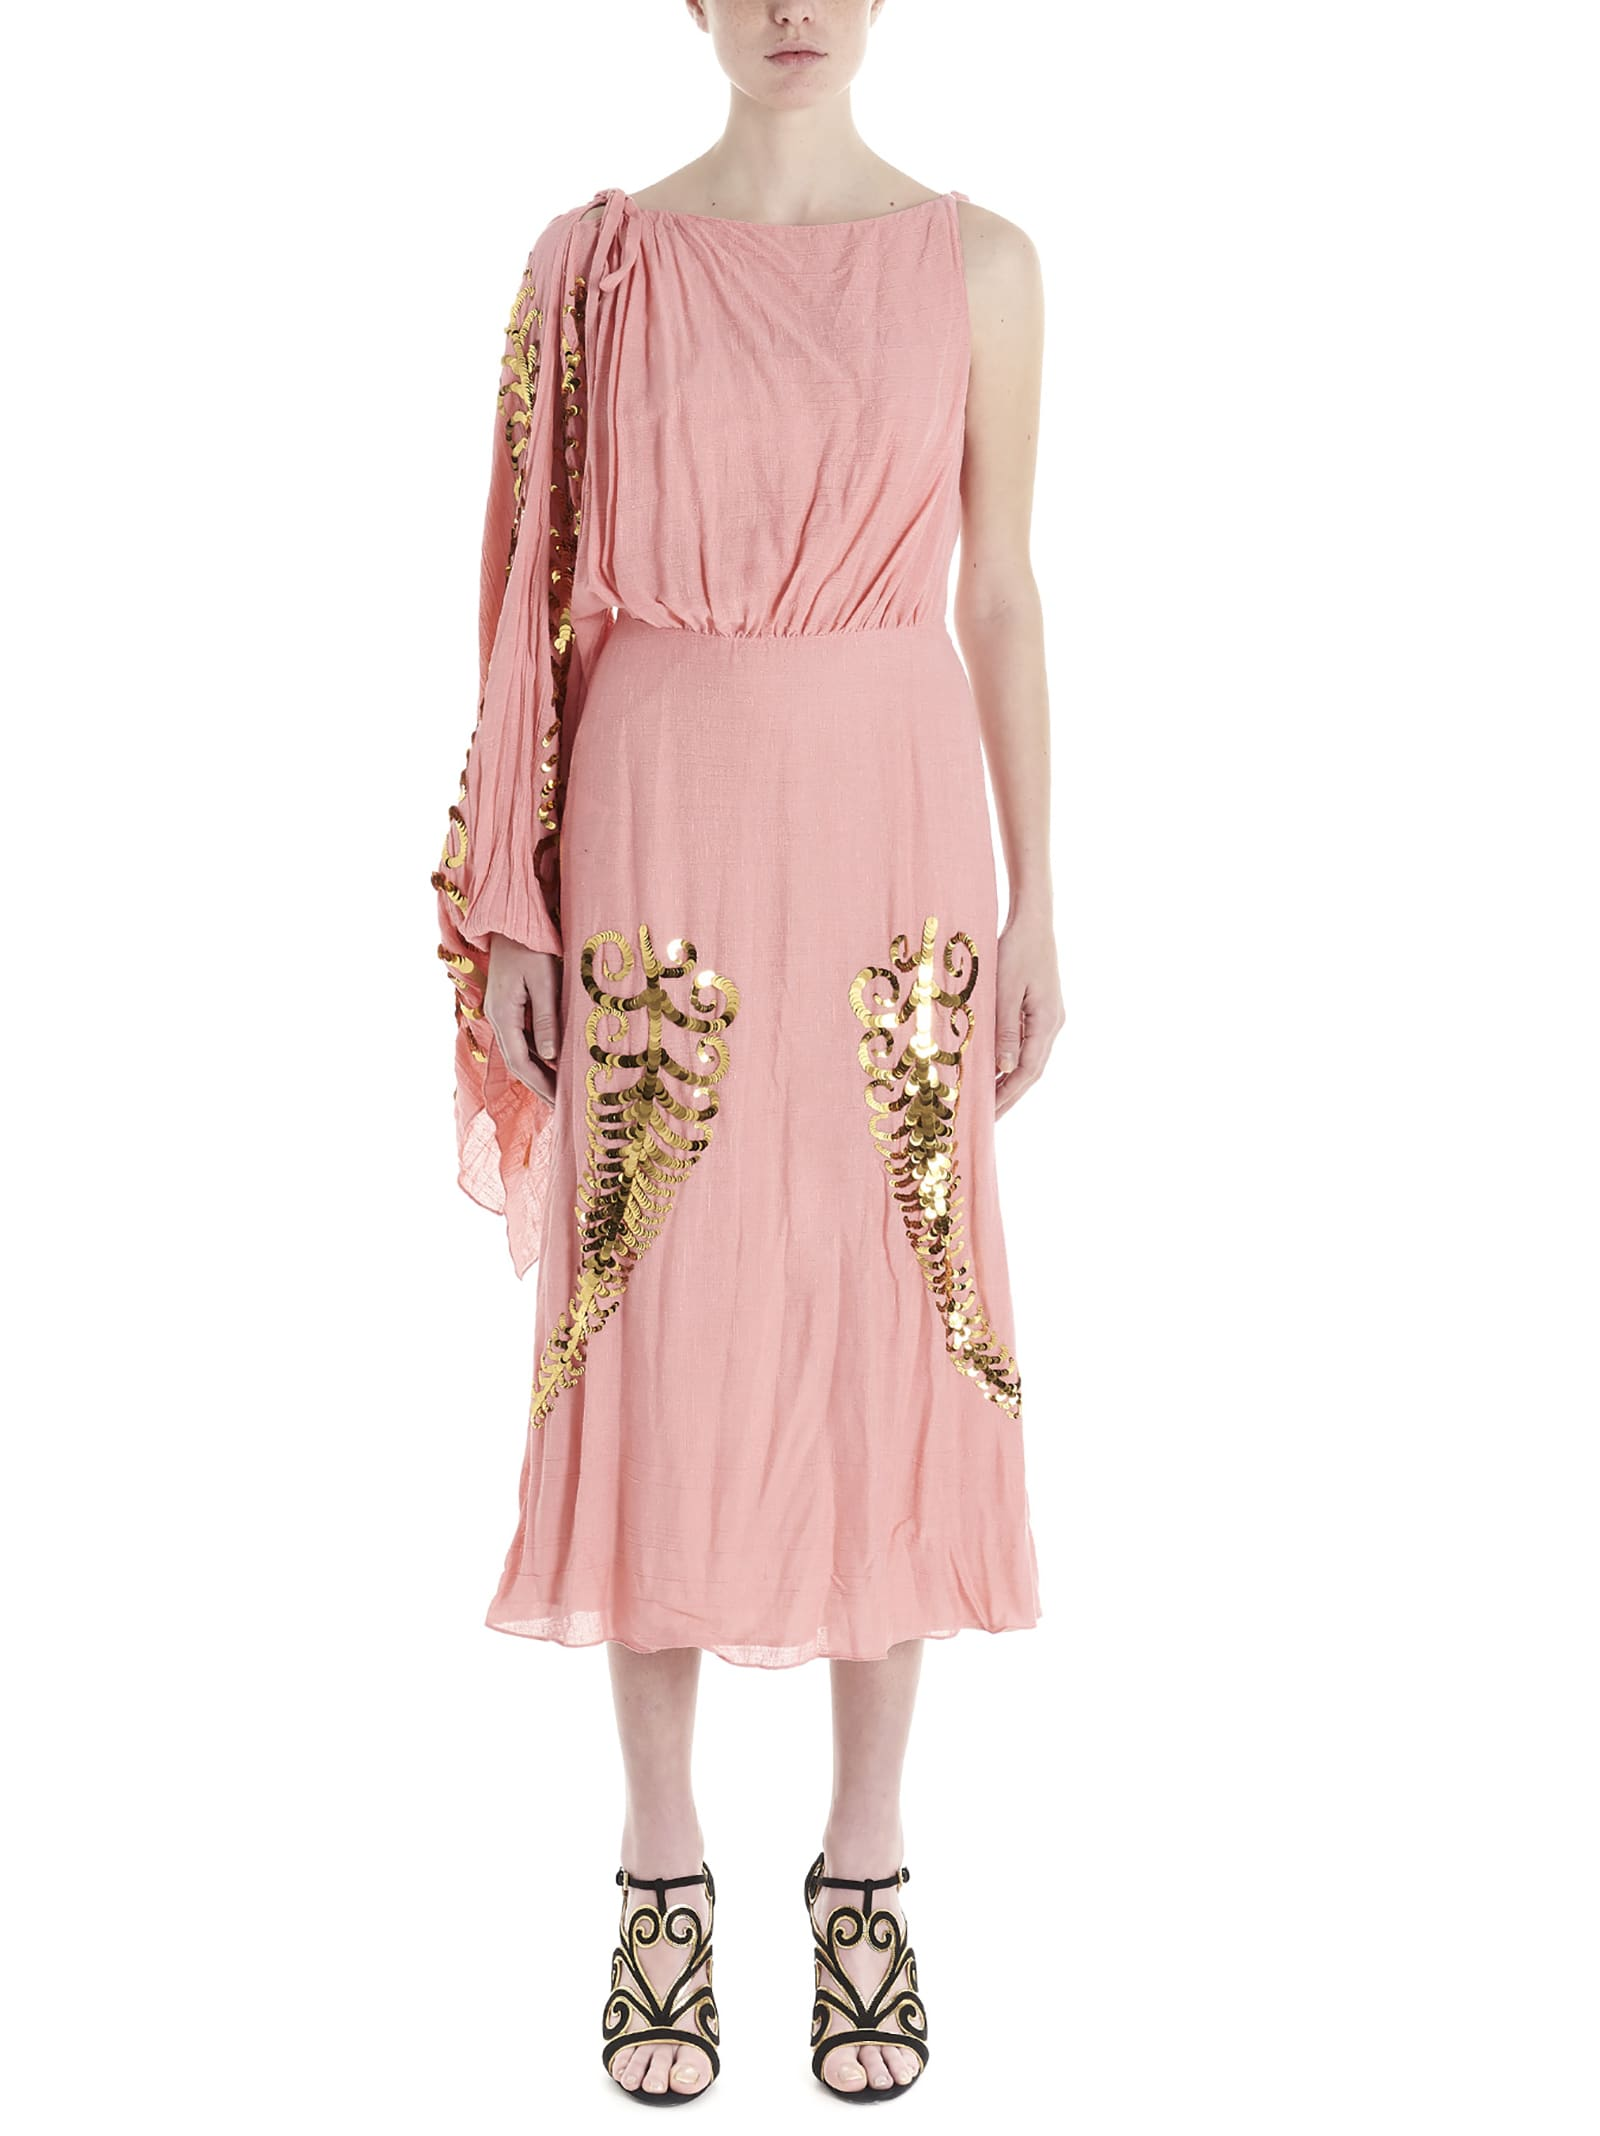 Prada riccio Dress